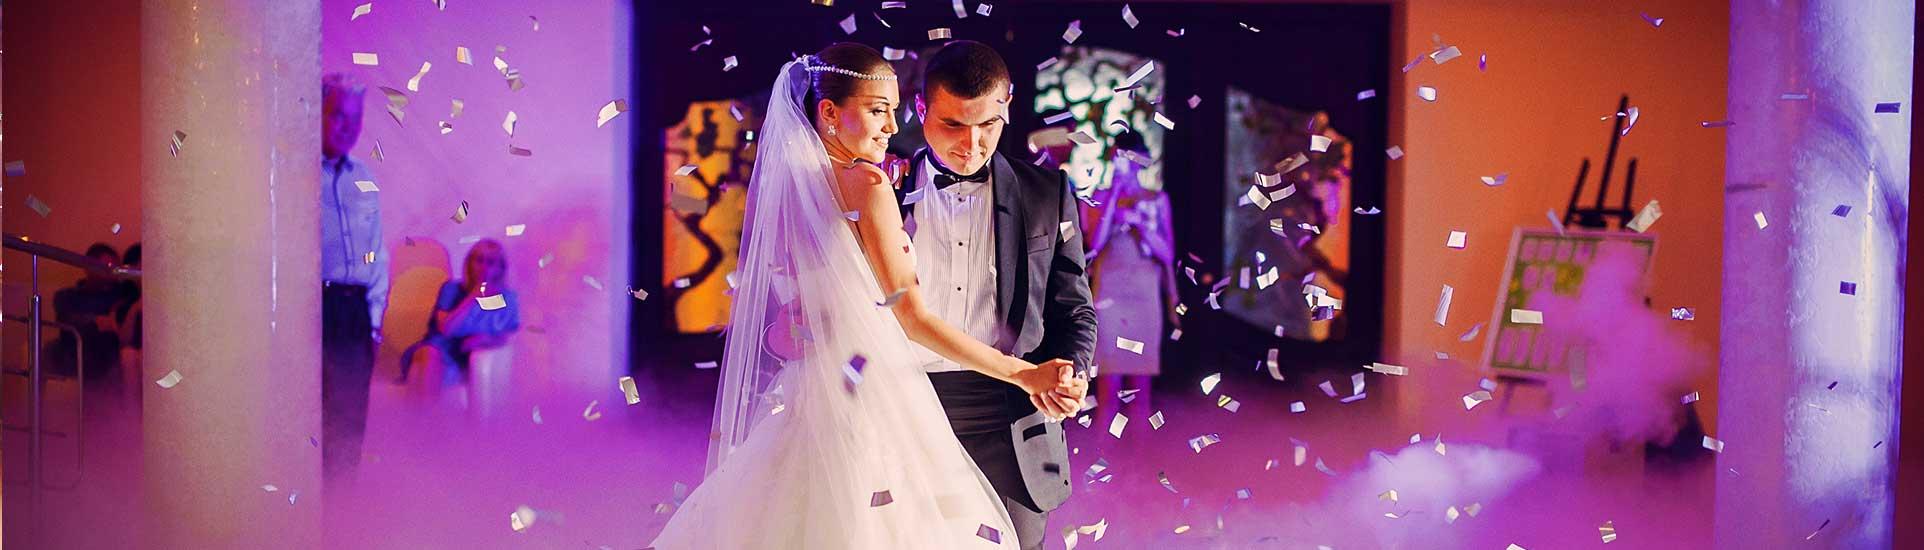 rhodes-weddings-comfeti-show-header